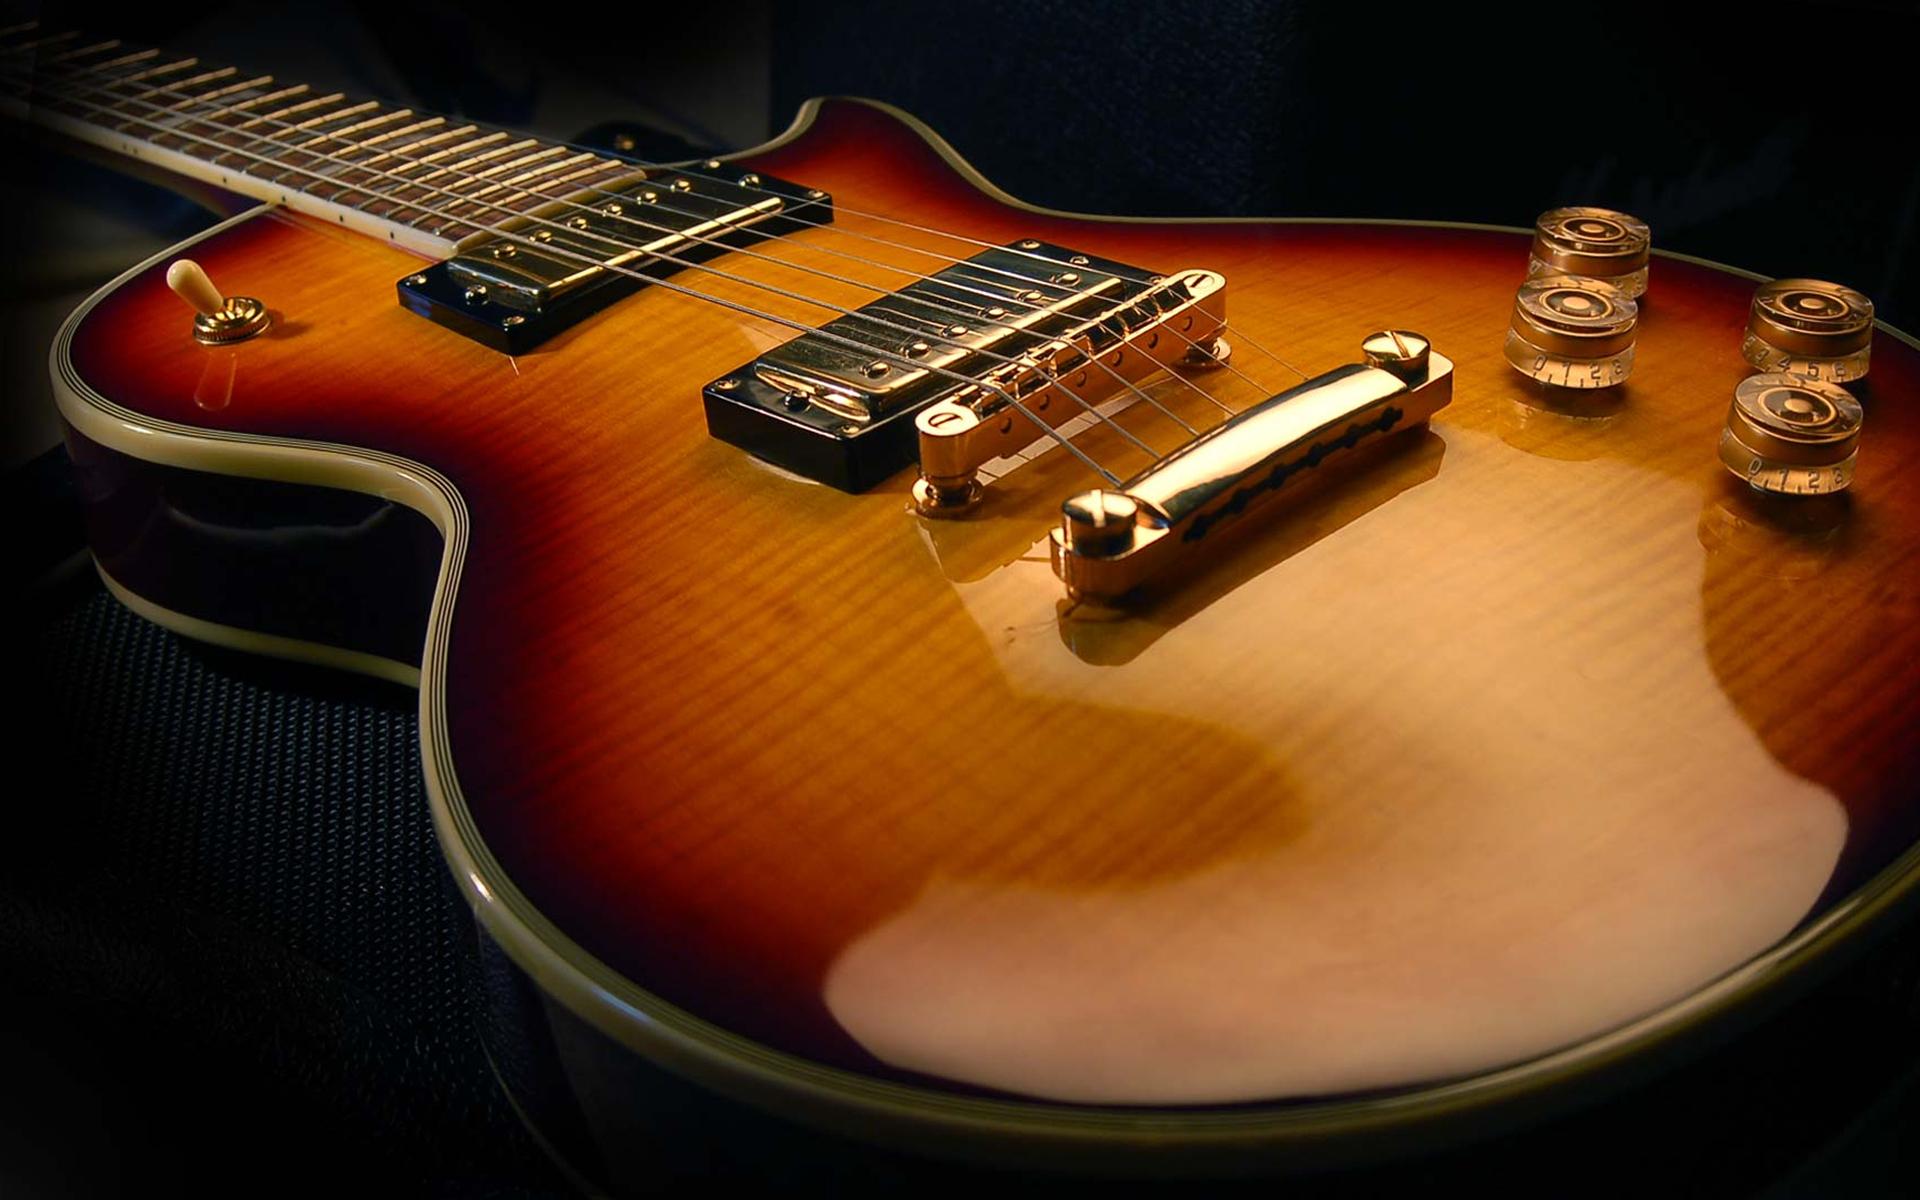 ... HD Guitar Wallpapers; HD Guitar Wallpapers